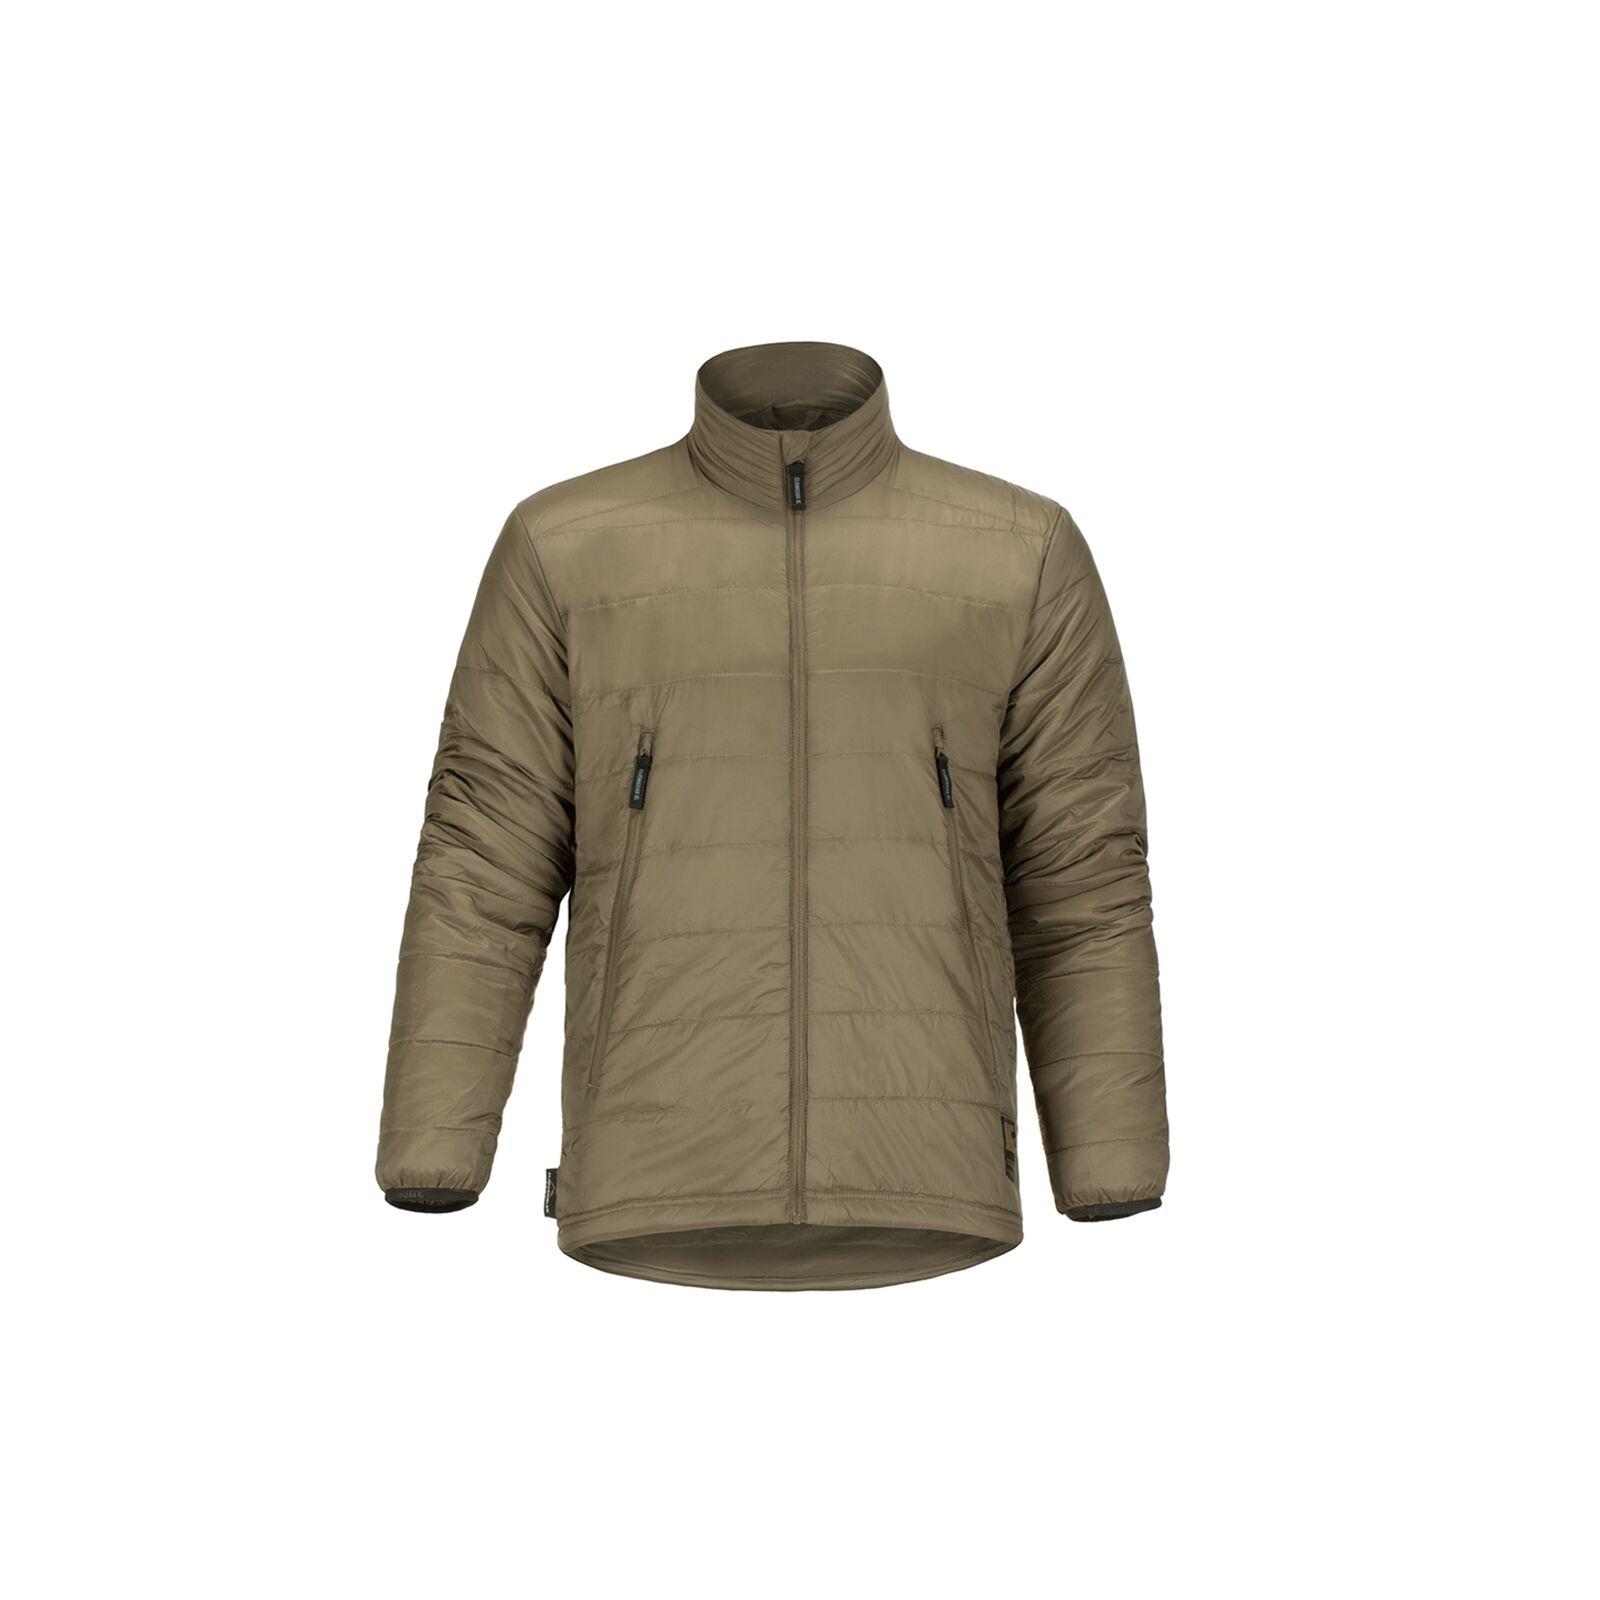 Clawgear CIL Combat insulation Light Giacca MilitareClimashield Apexral7013